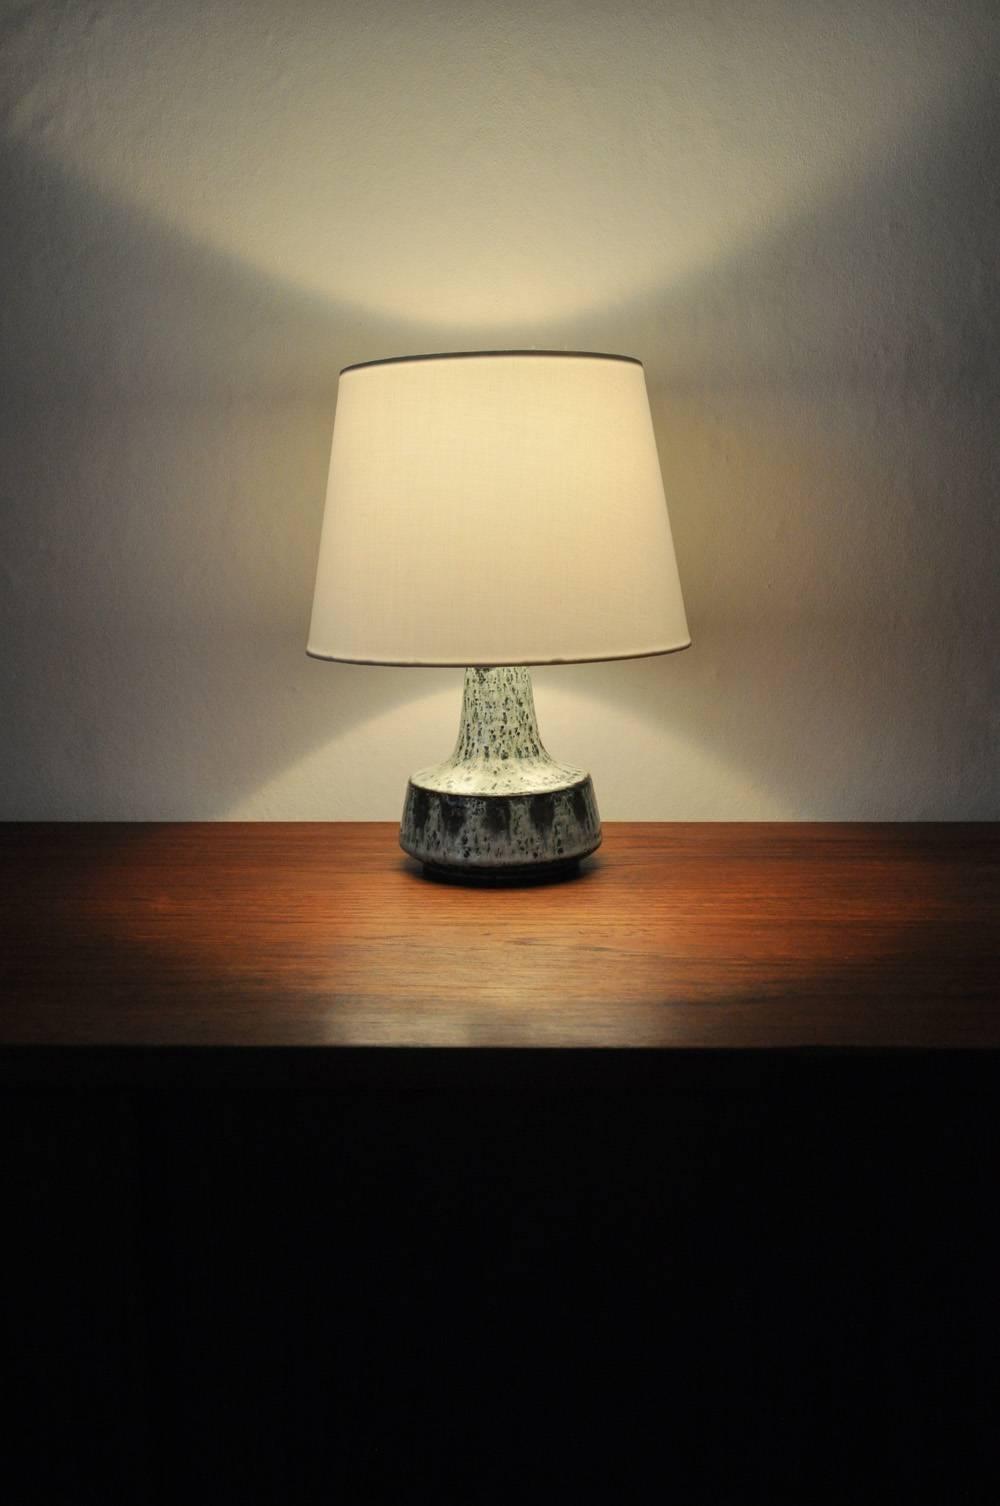 Handmade Ceramic Table Lamp By Søholm, Denmark